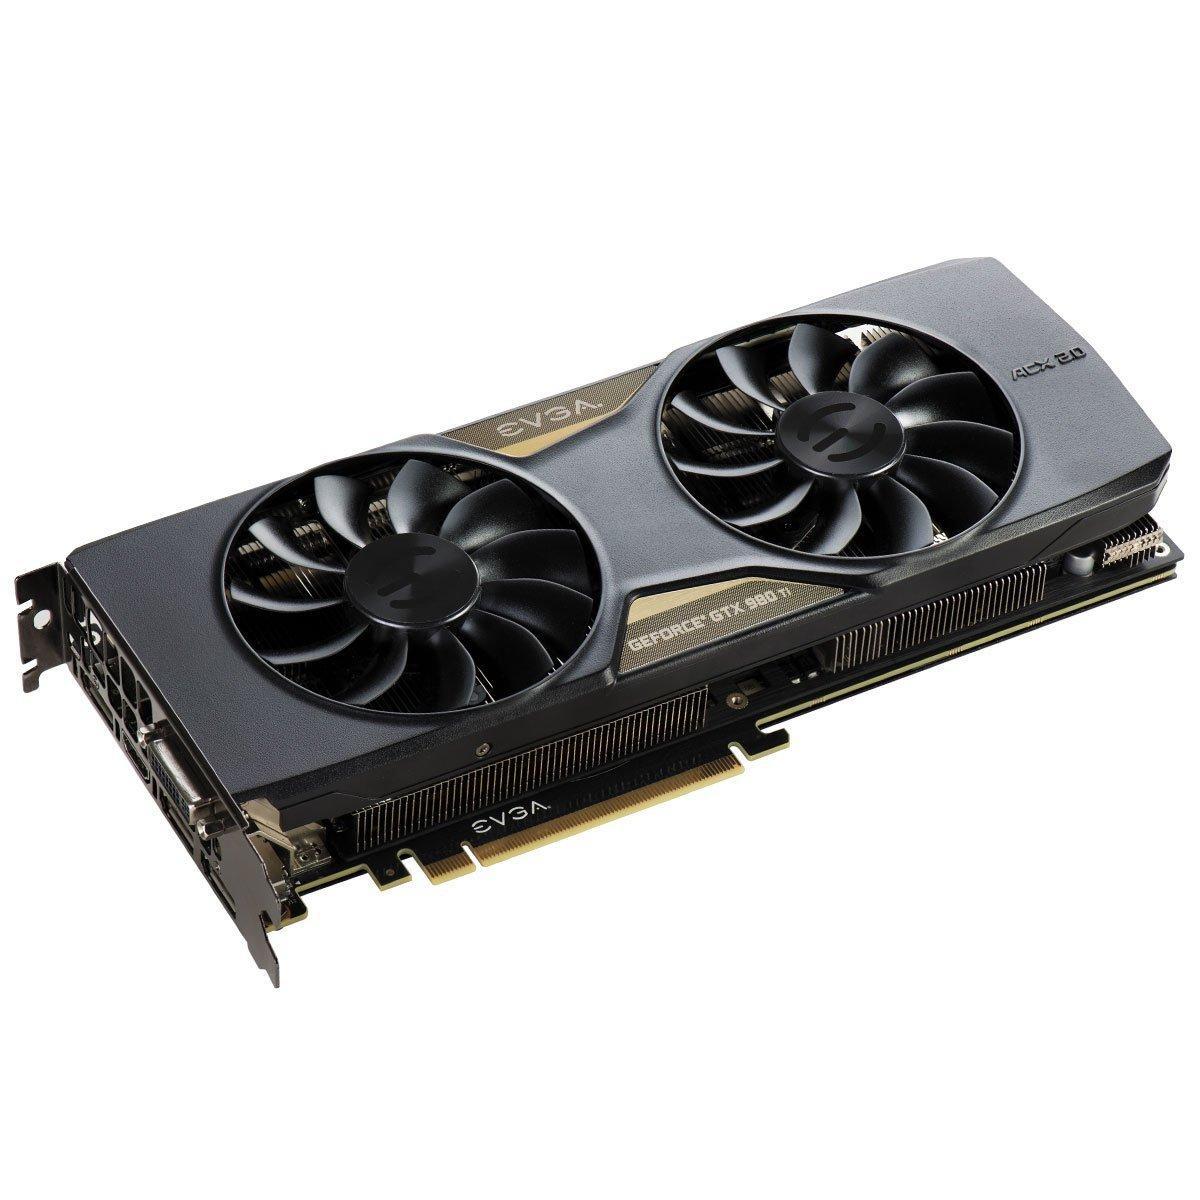 Carte graphique Nvidia GeForce GTX 980 Ti (06G-P4-4995-KR) - 1190 MHz, 6144 Mo